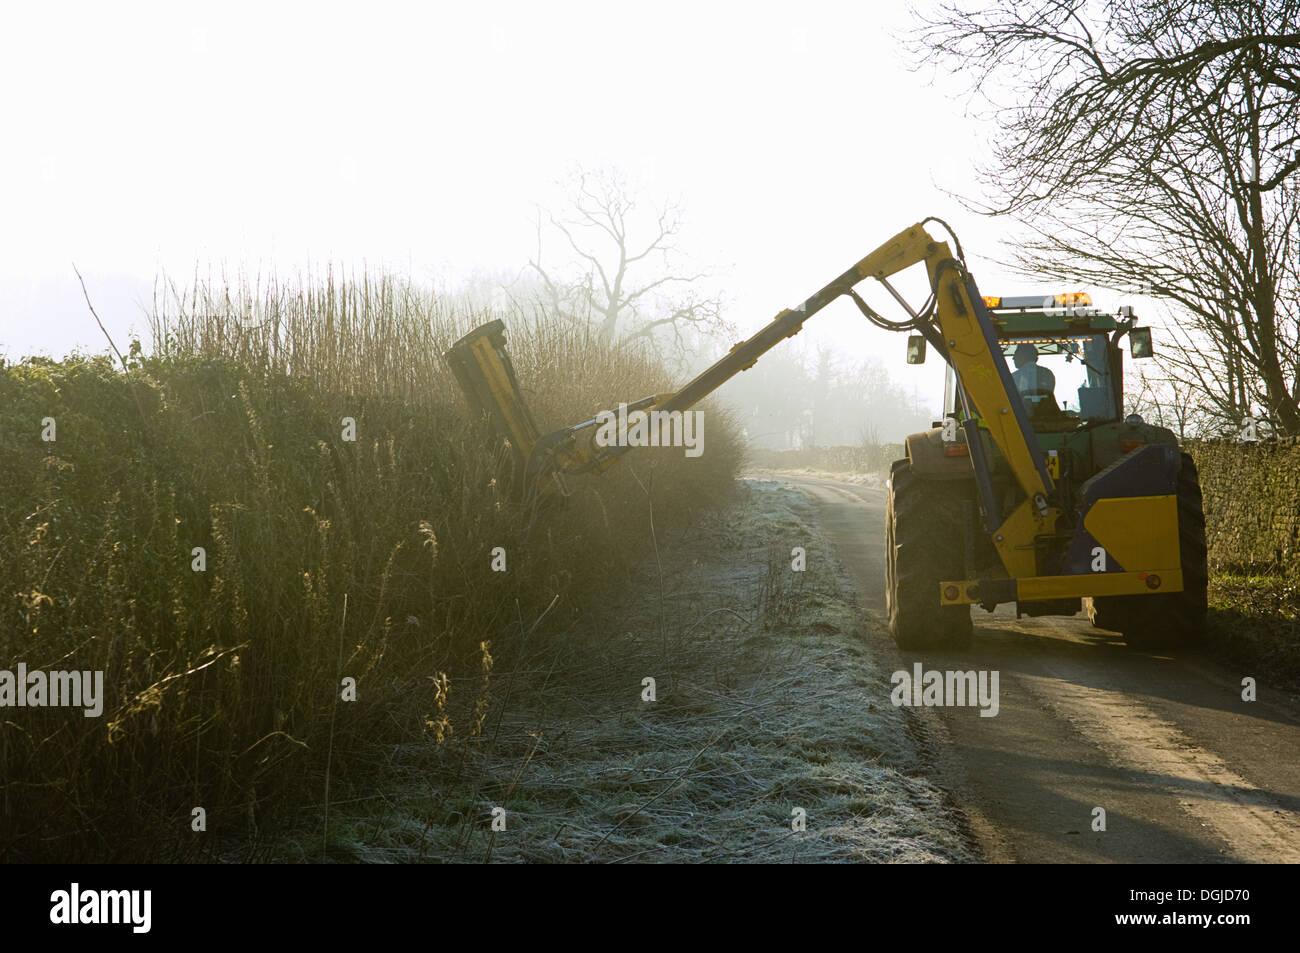 Traktor schneiden Hecke entlang Landstraße Stockbild